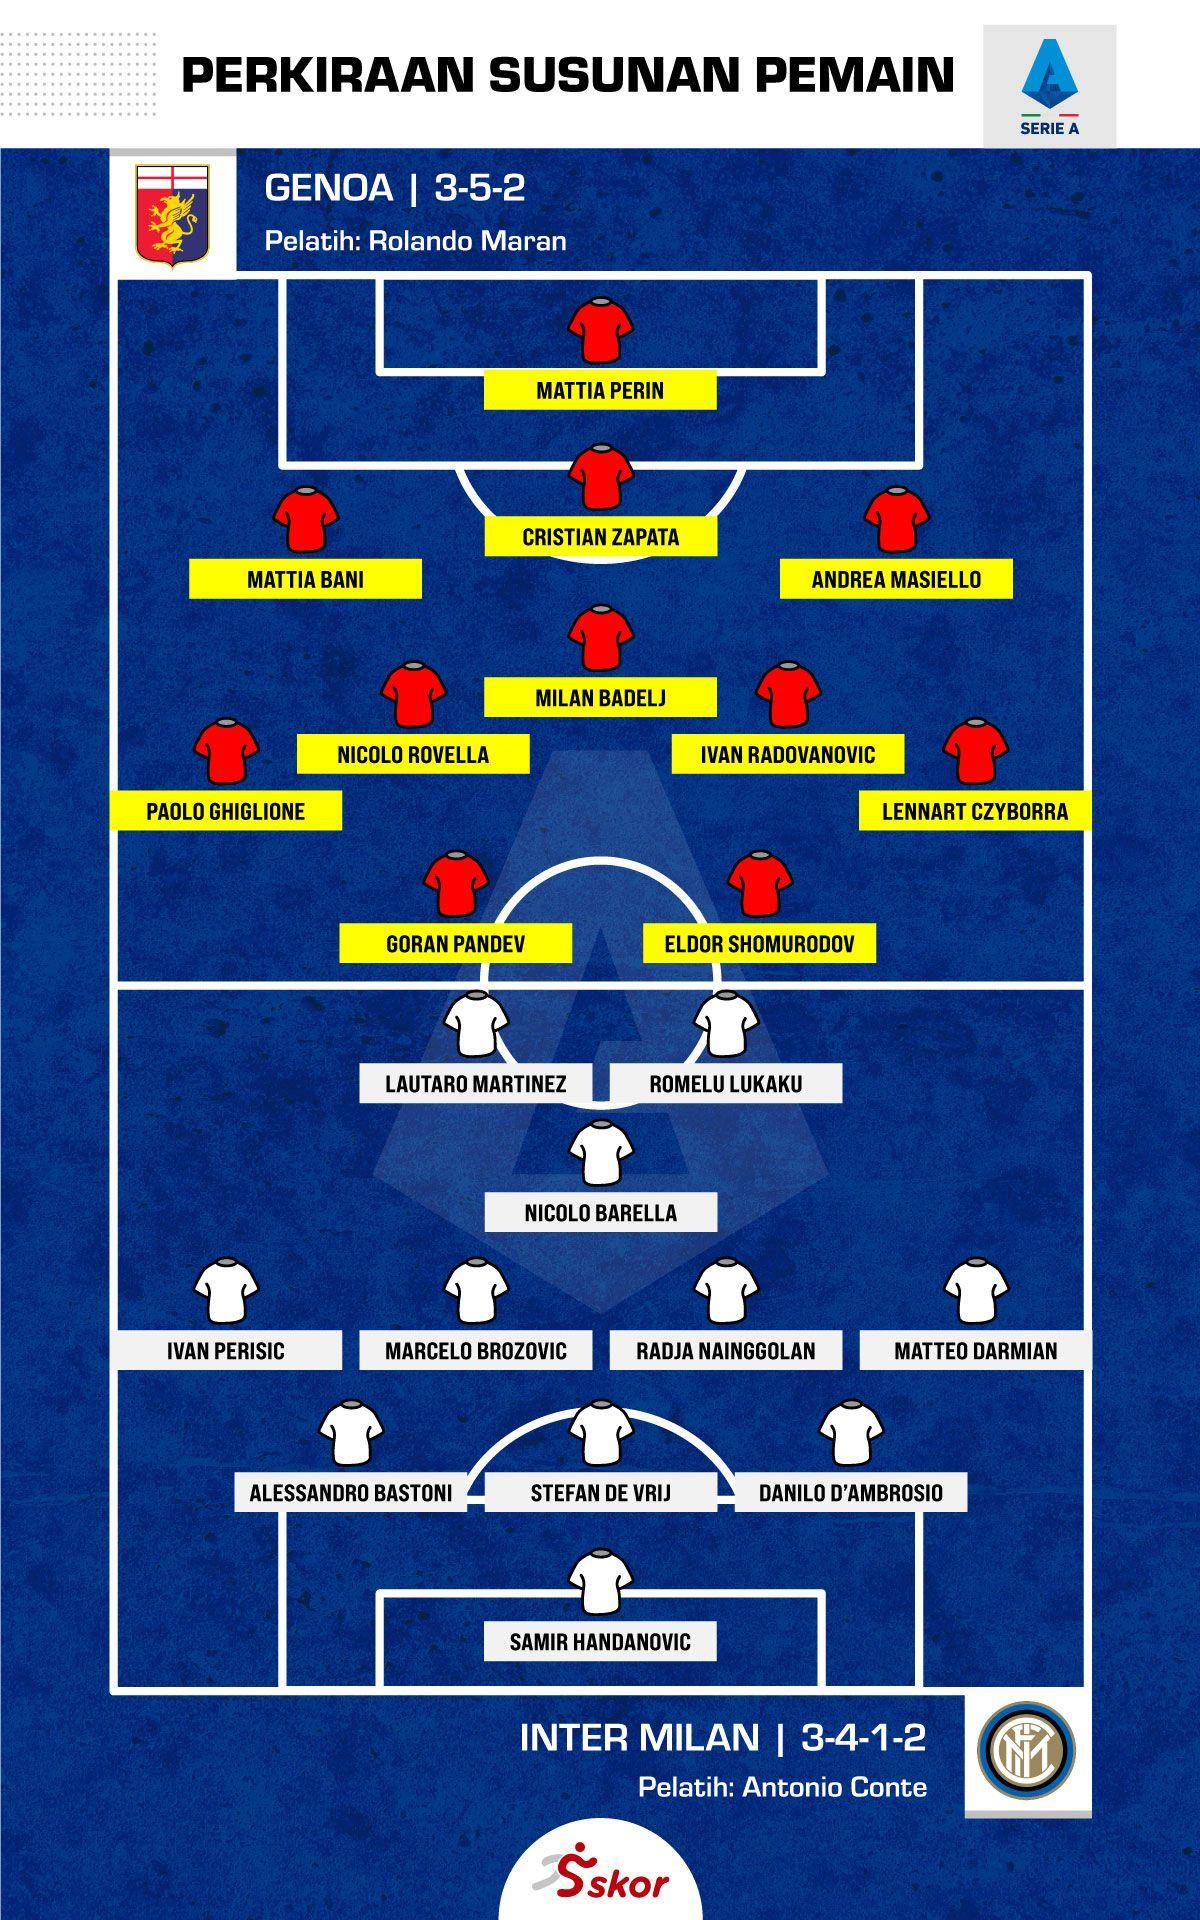 Perkiraan Susunan Pemain Genoa vs Inter Milan